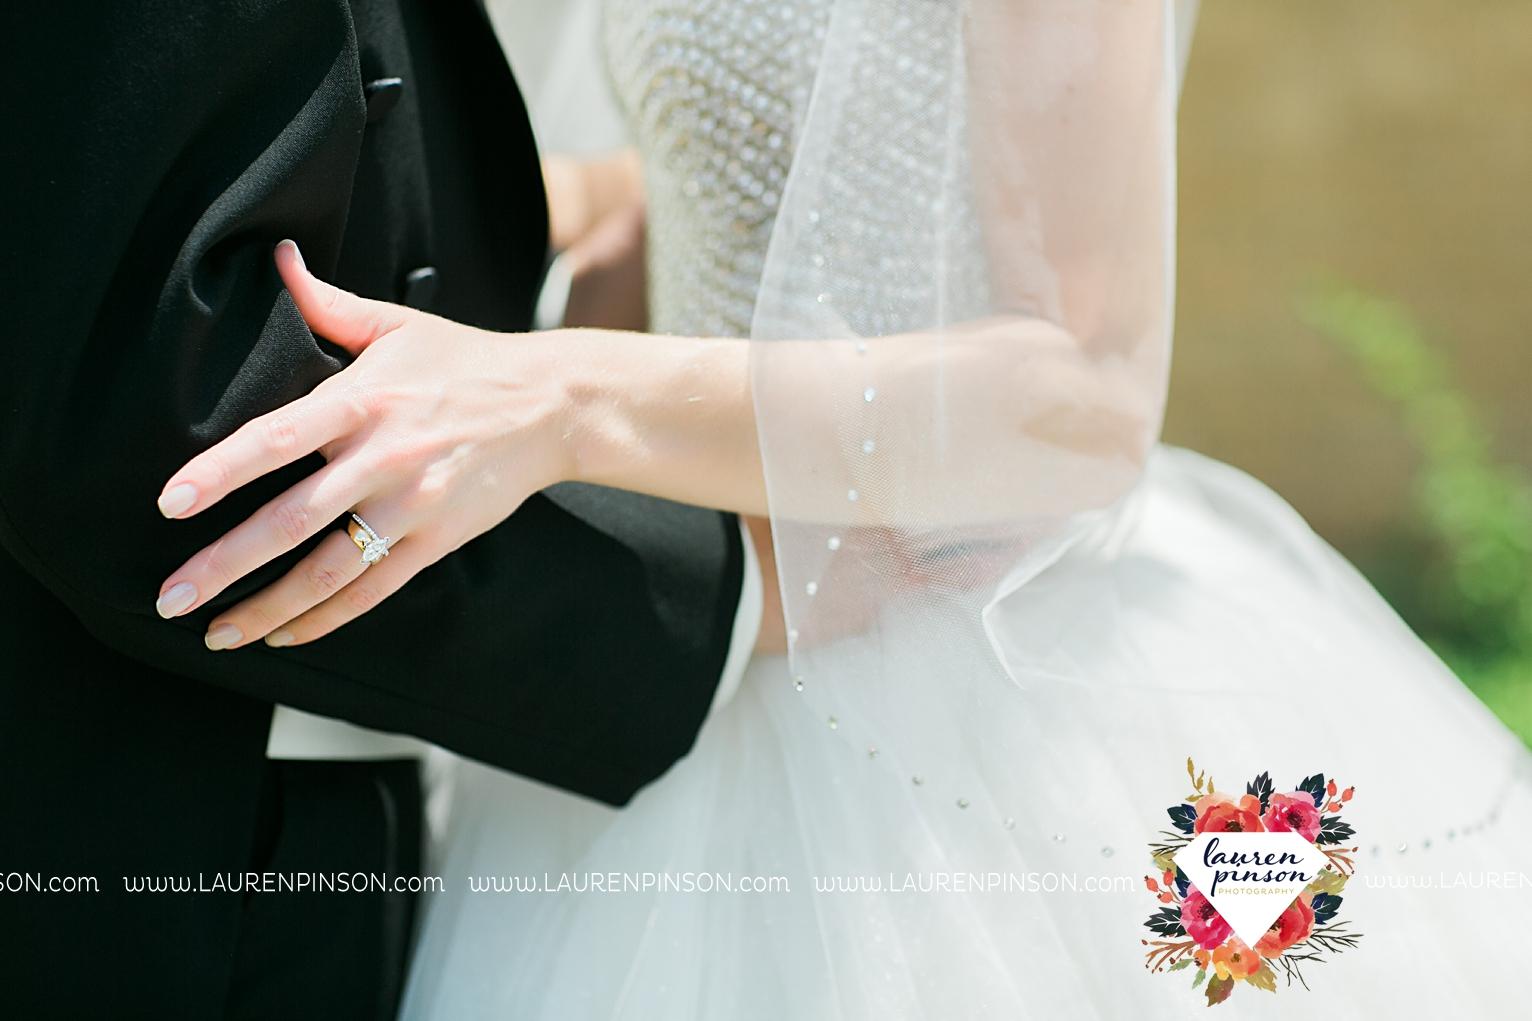 wichita-falls-texas-wedding-photographer-the-forum-by-the-kemp-mayfield-events-ulta-gold-glitter_2836.jpg